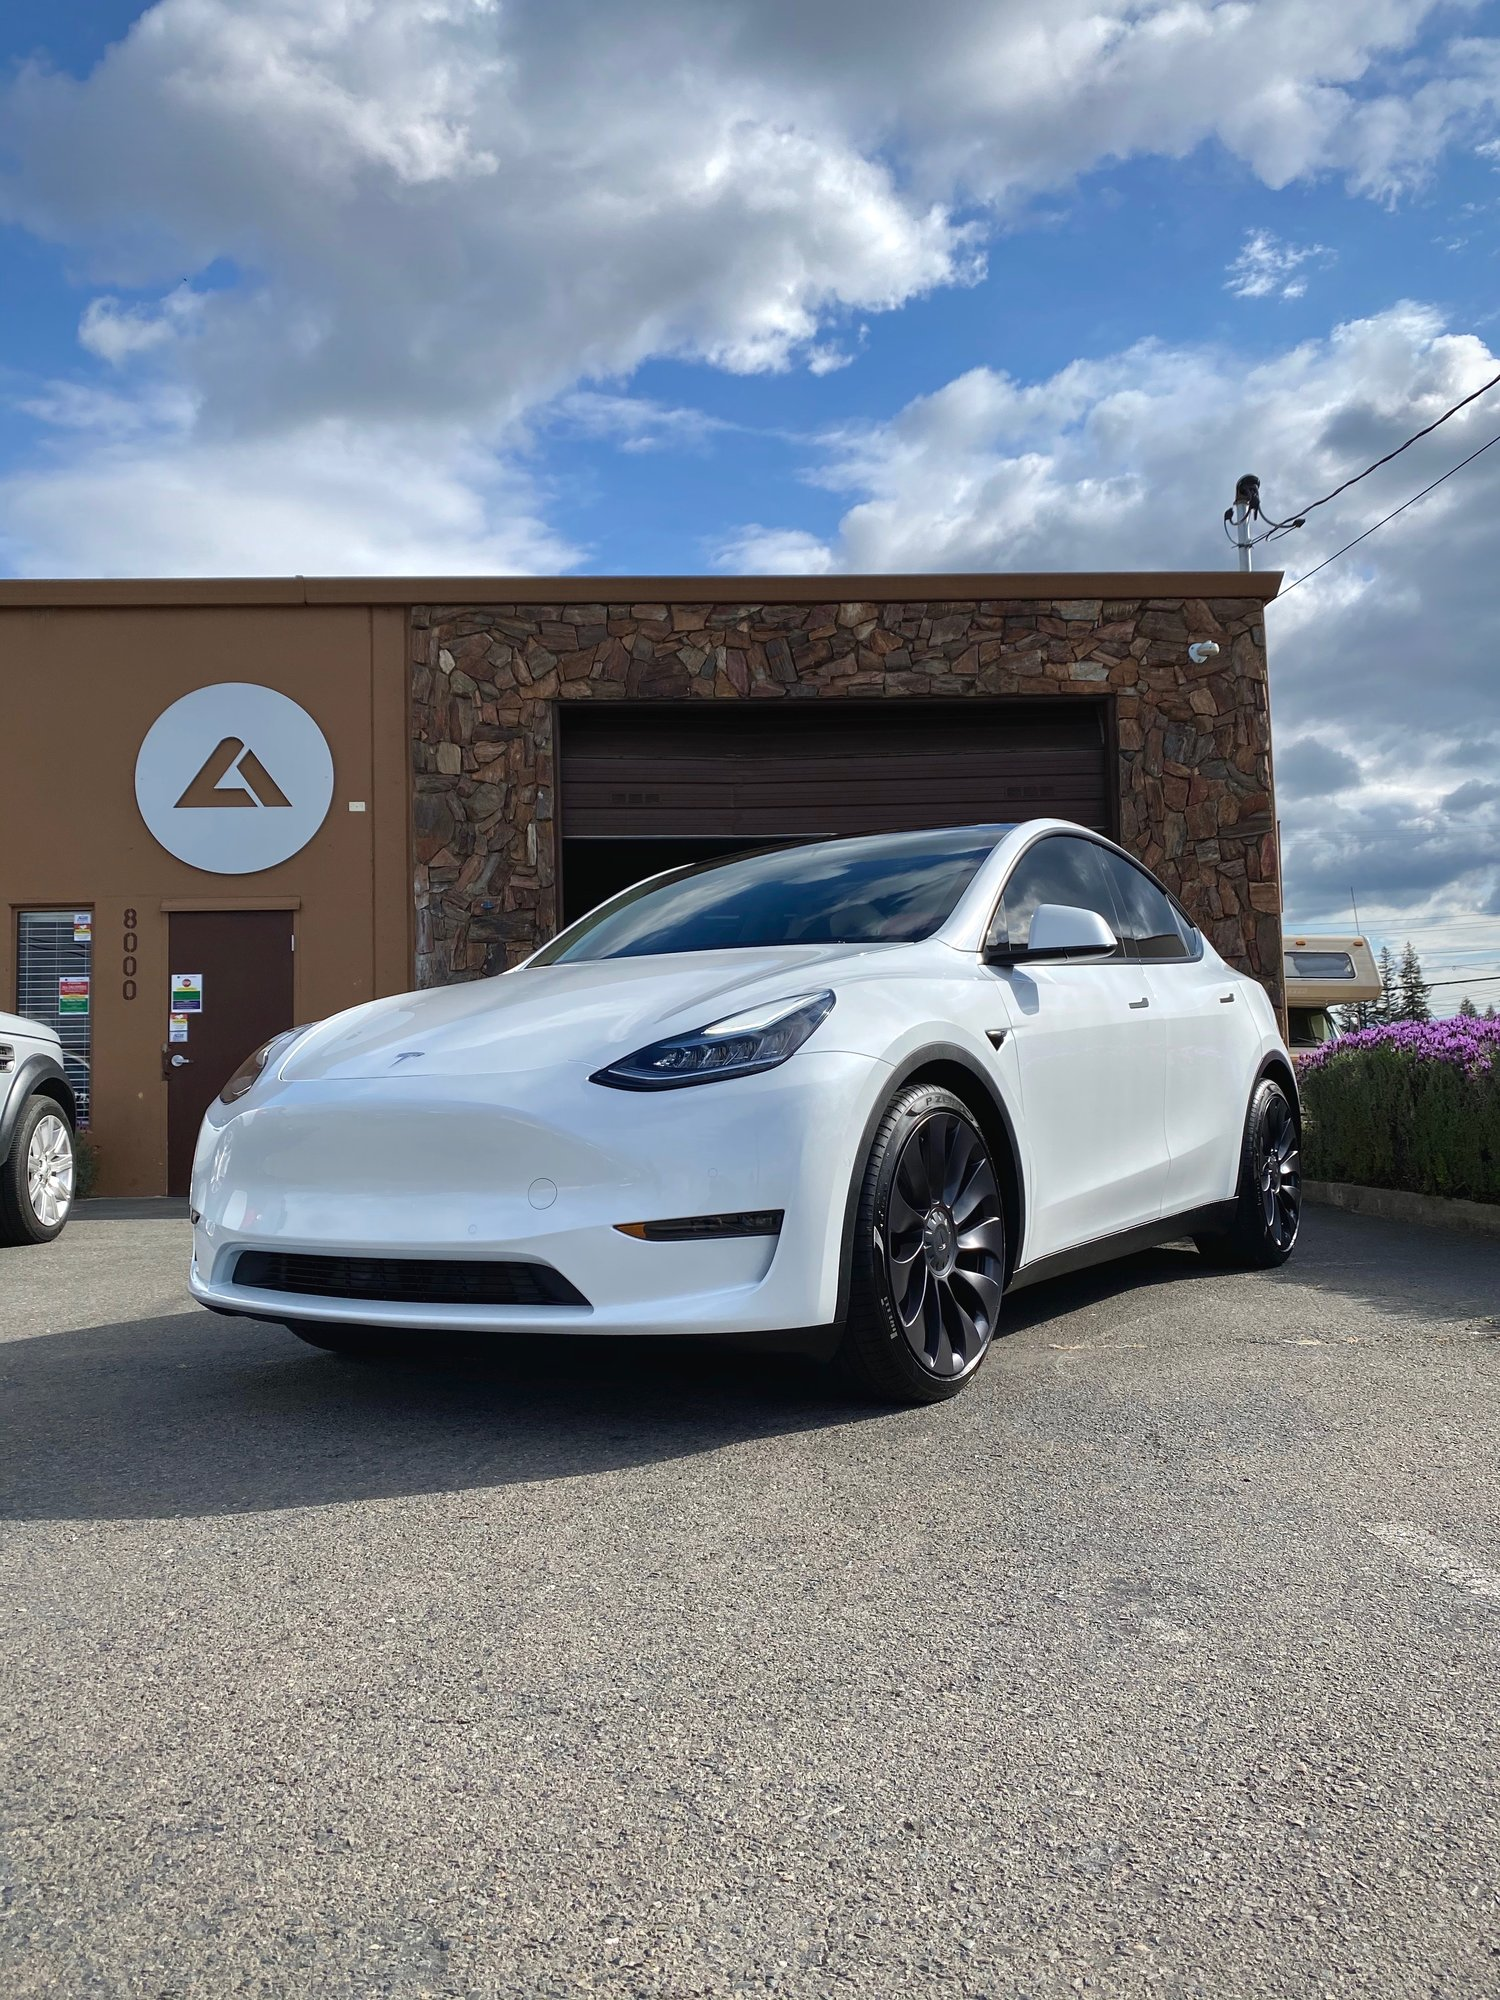 2020 Tesla Model Y Pearl White Multi-Coat  (Appearance Solutions-Sacramento,CA)~38.JPG